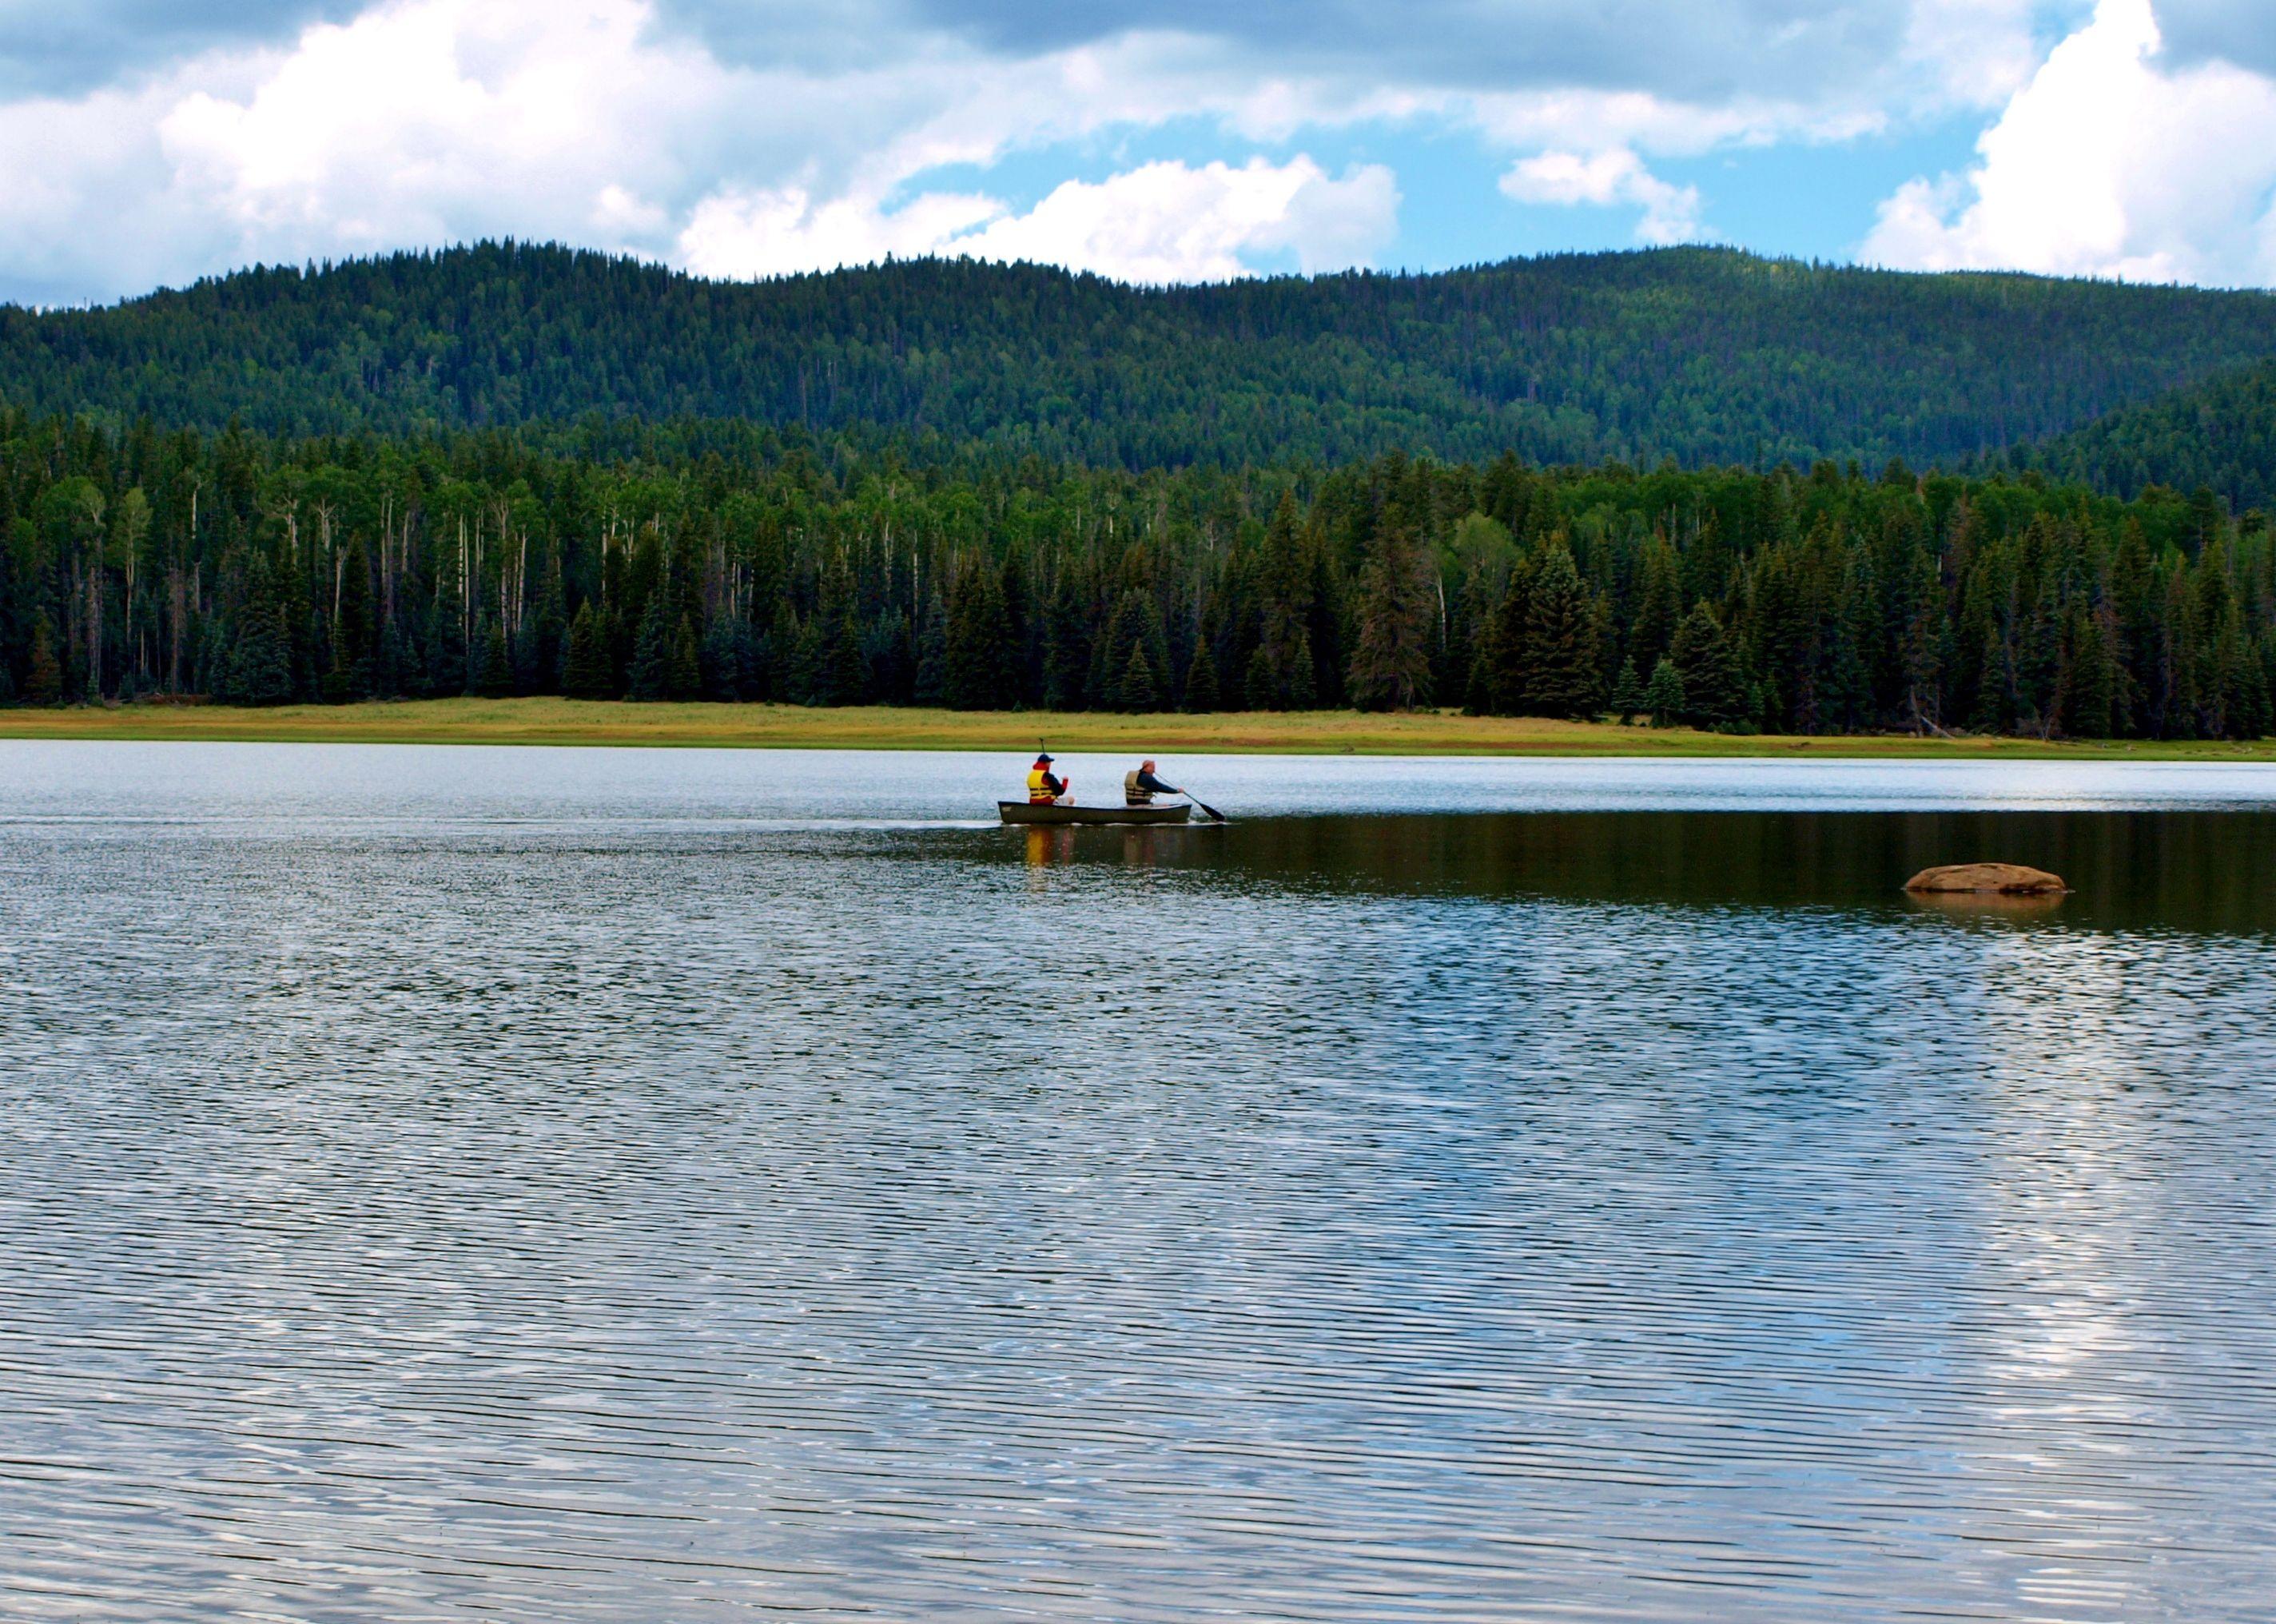 Big lake arizona places i love pinterest for Fishing spots in arizona